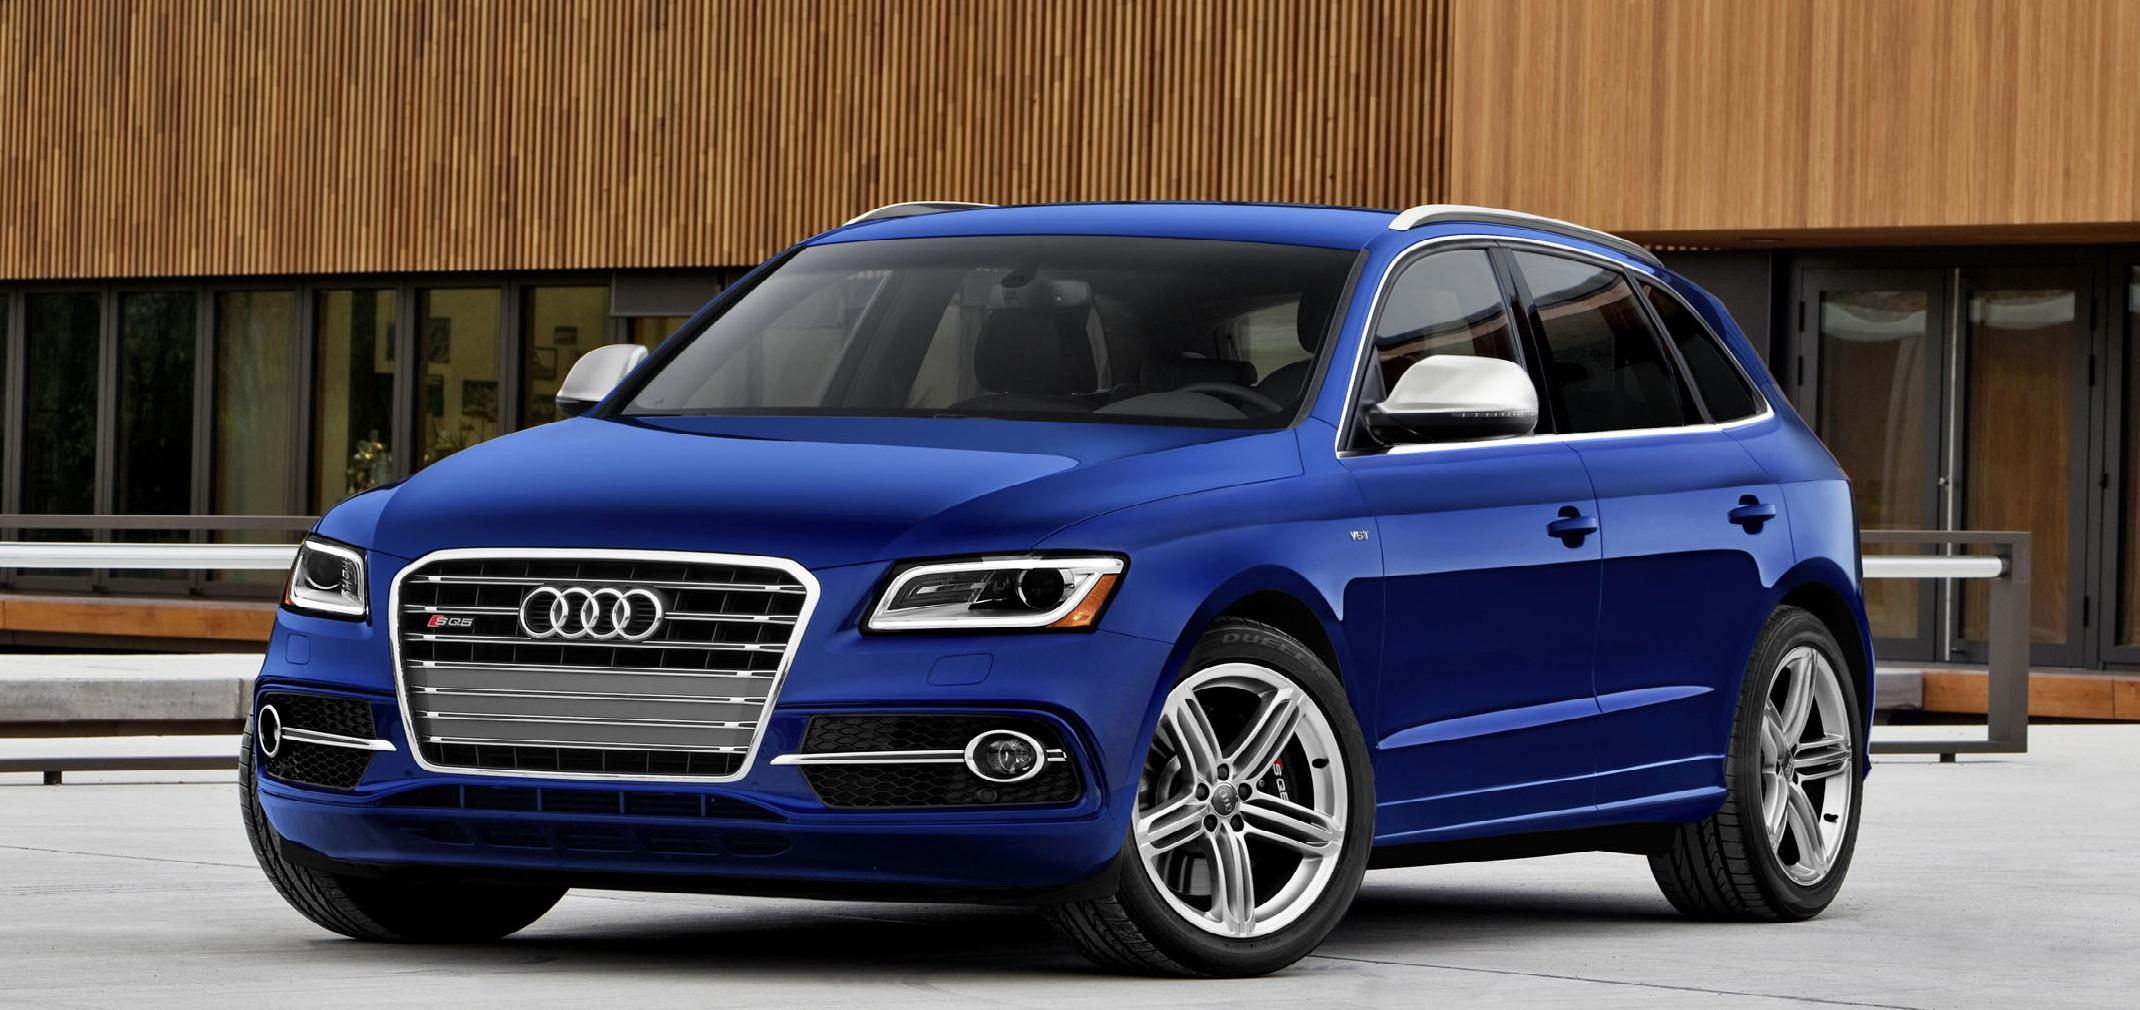 Audi_SQ5_gasolina_6